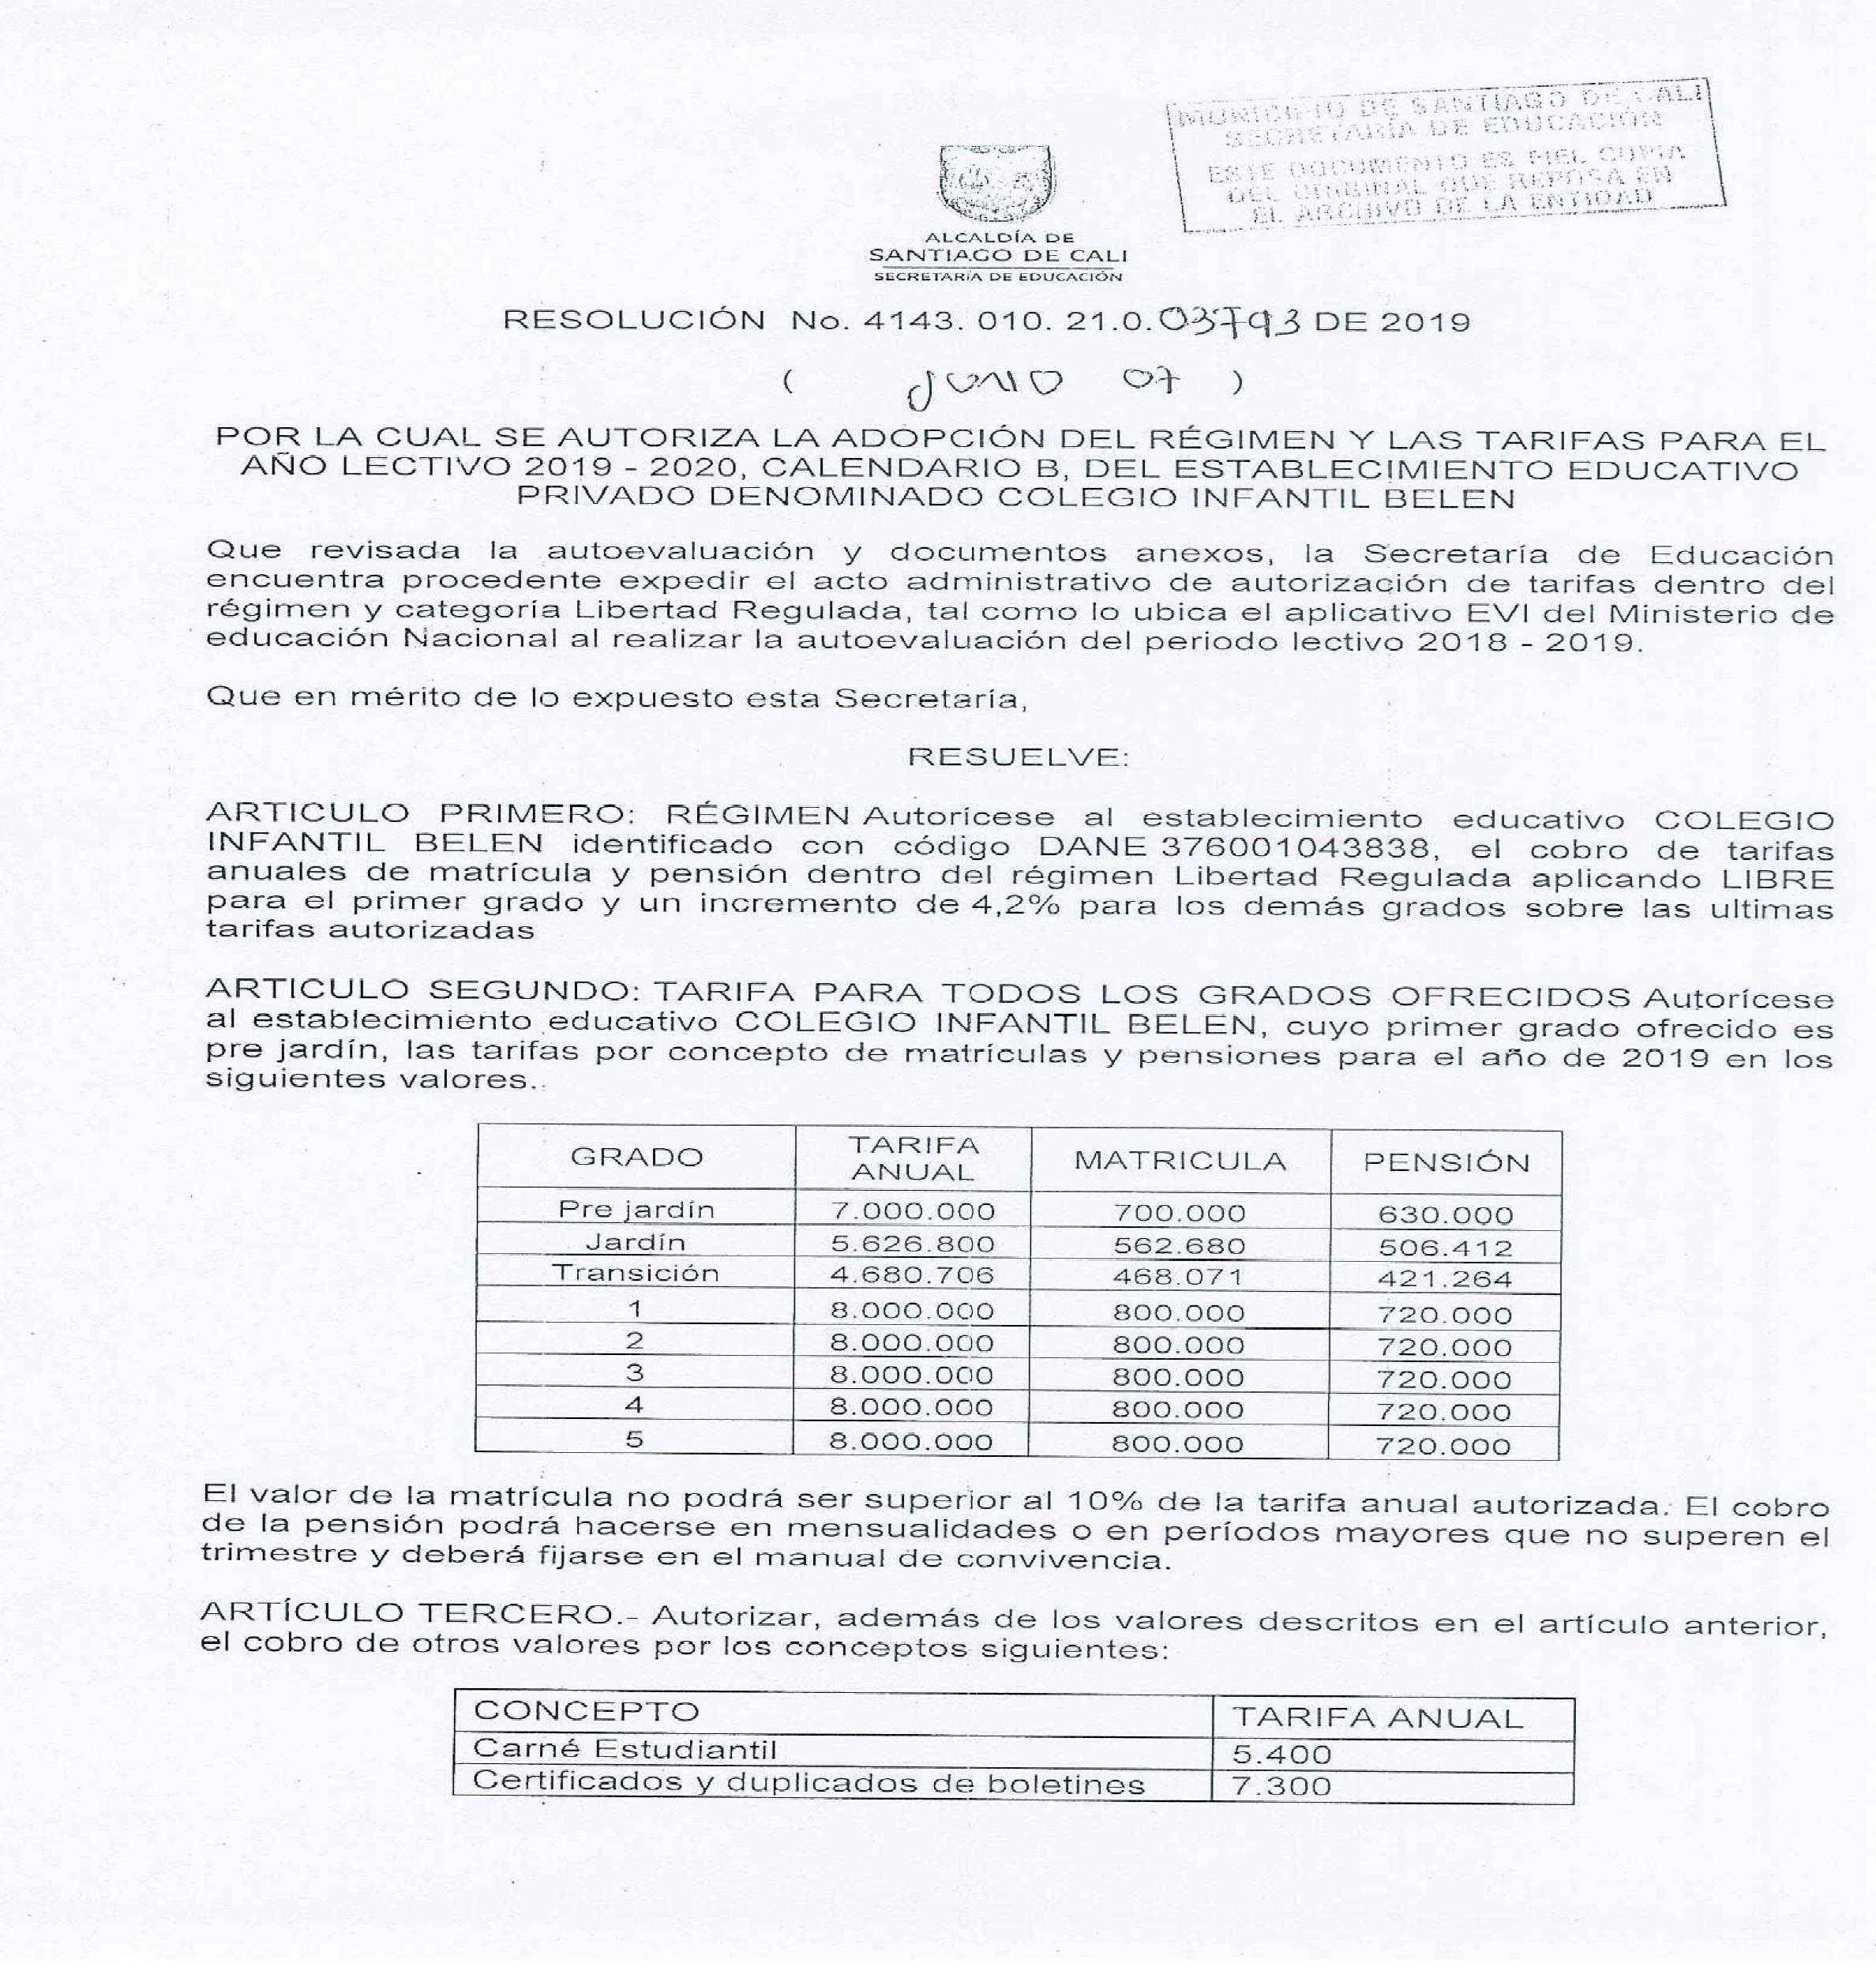 Calendario Belen 2020.Resolucion 2019 2020 Colegiobelen